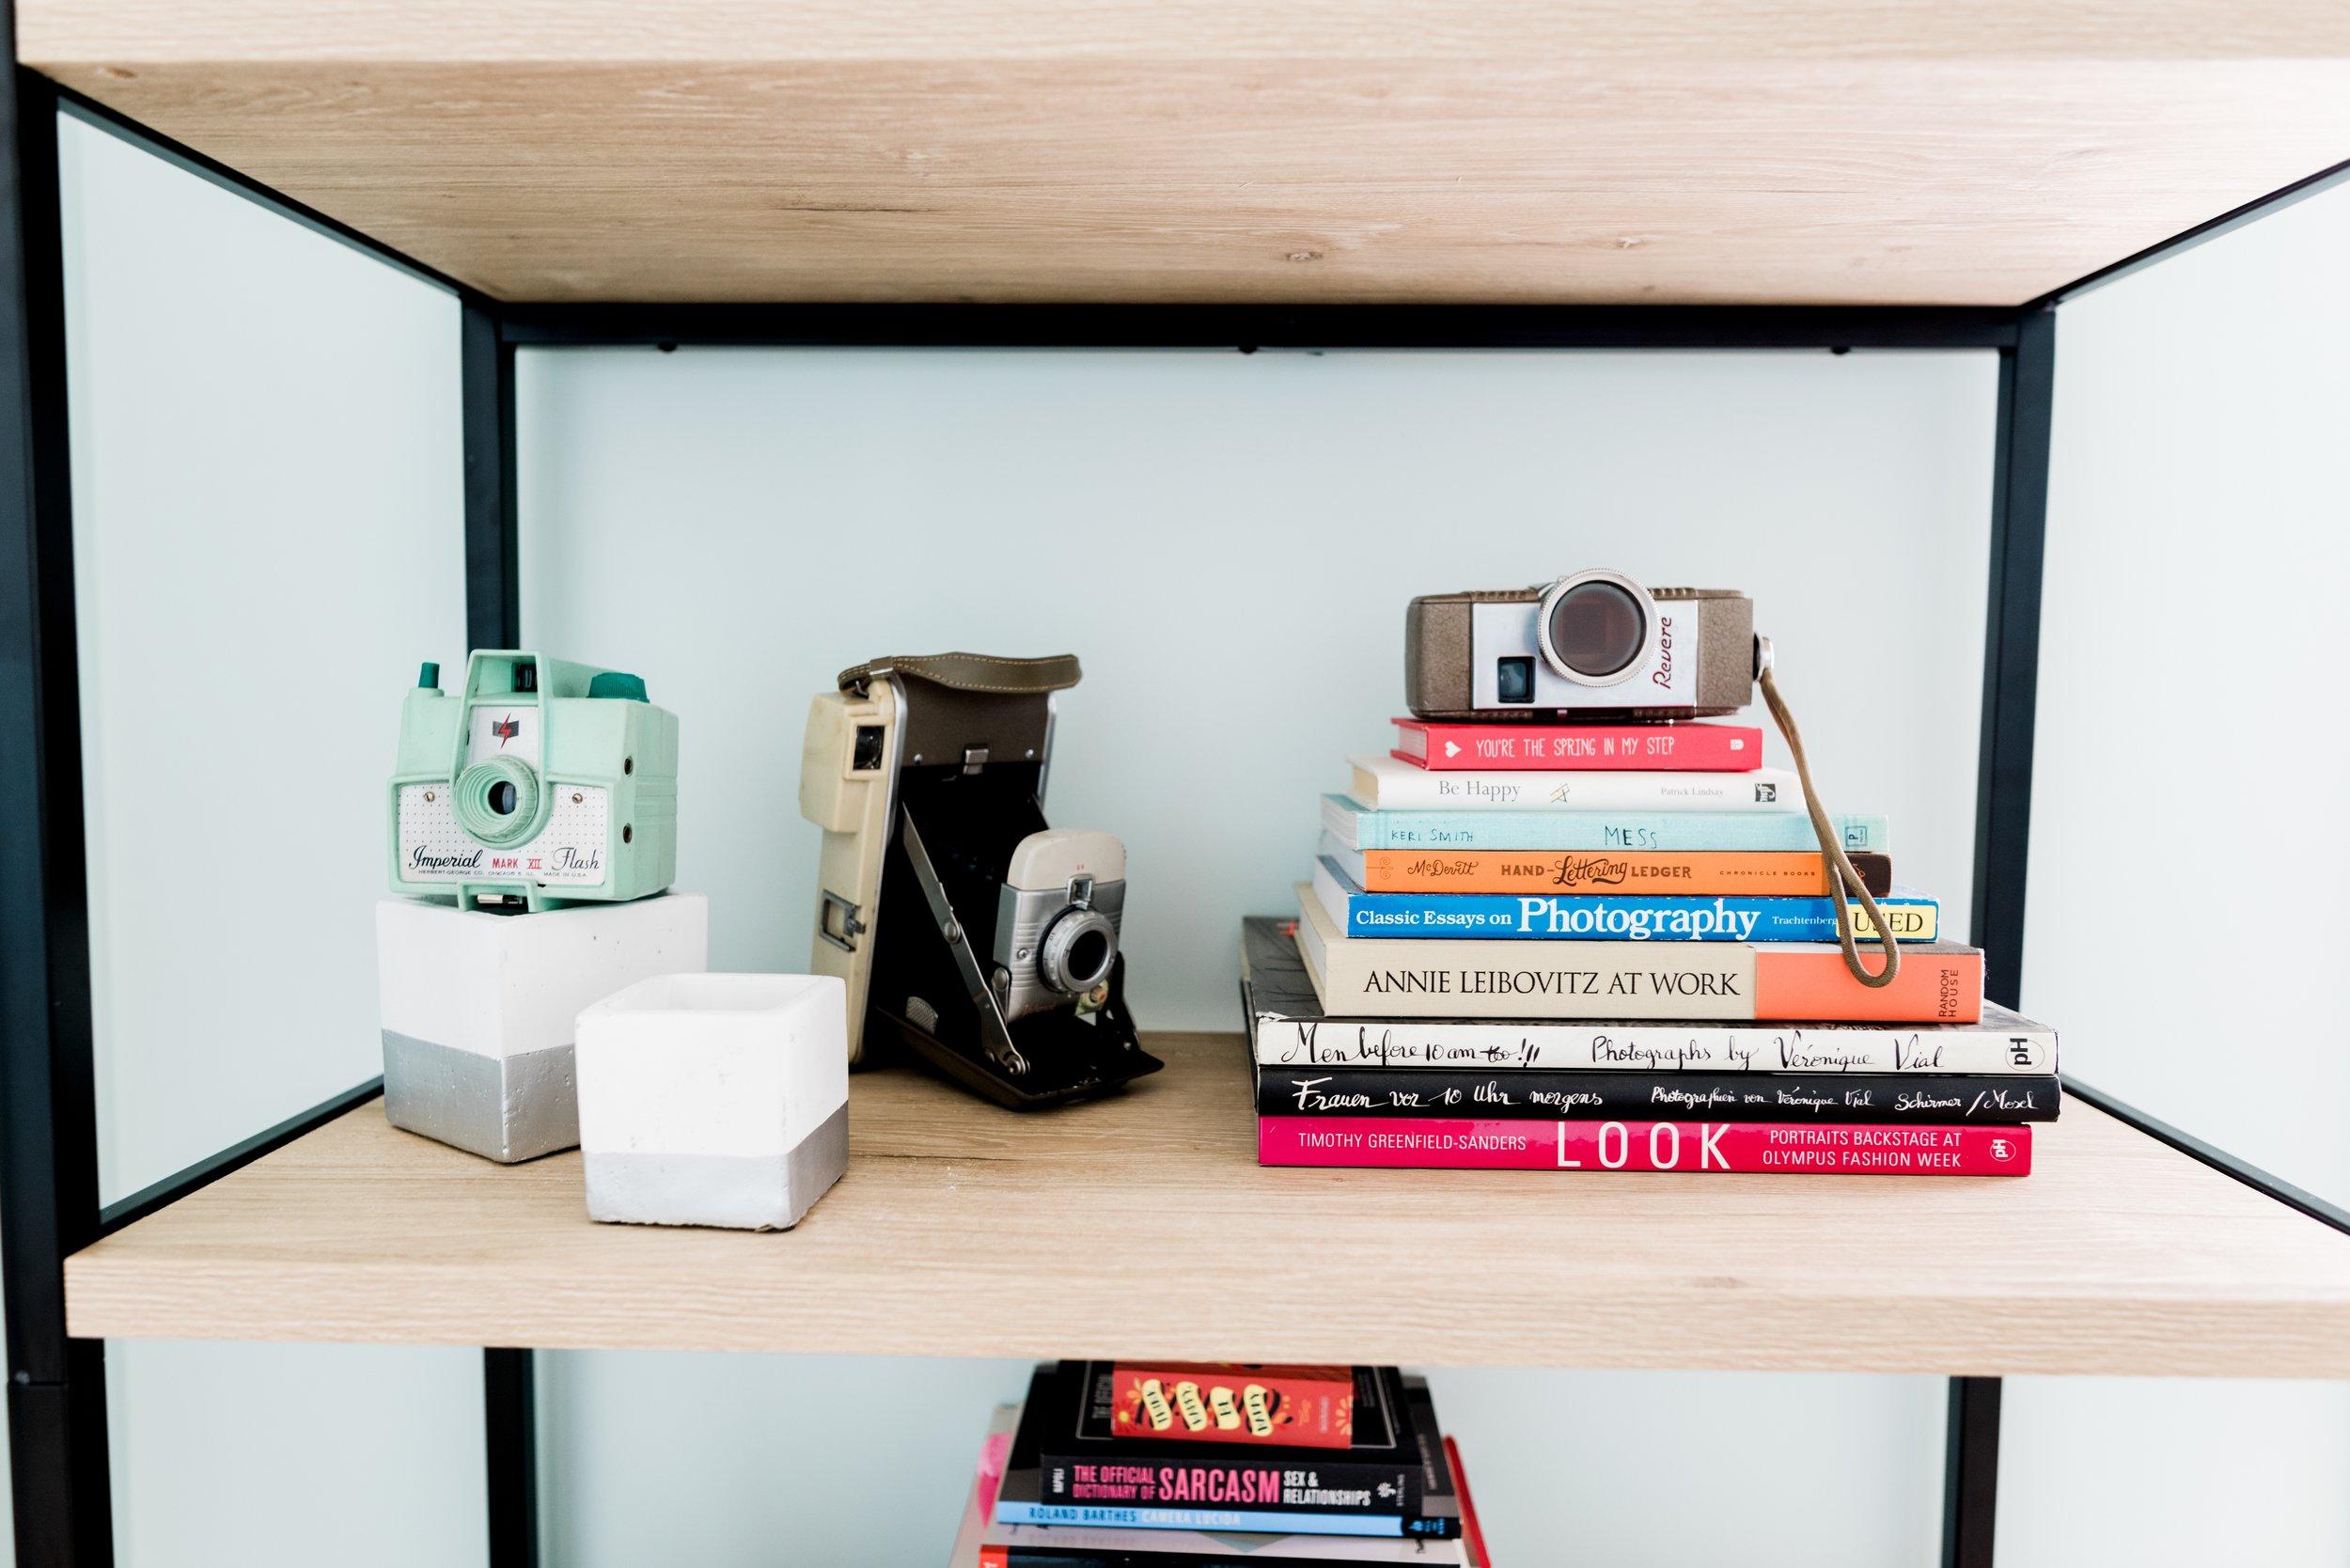 Kayla Sue 's bright and cheery photobook shelf.